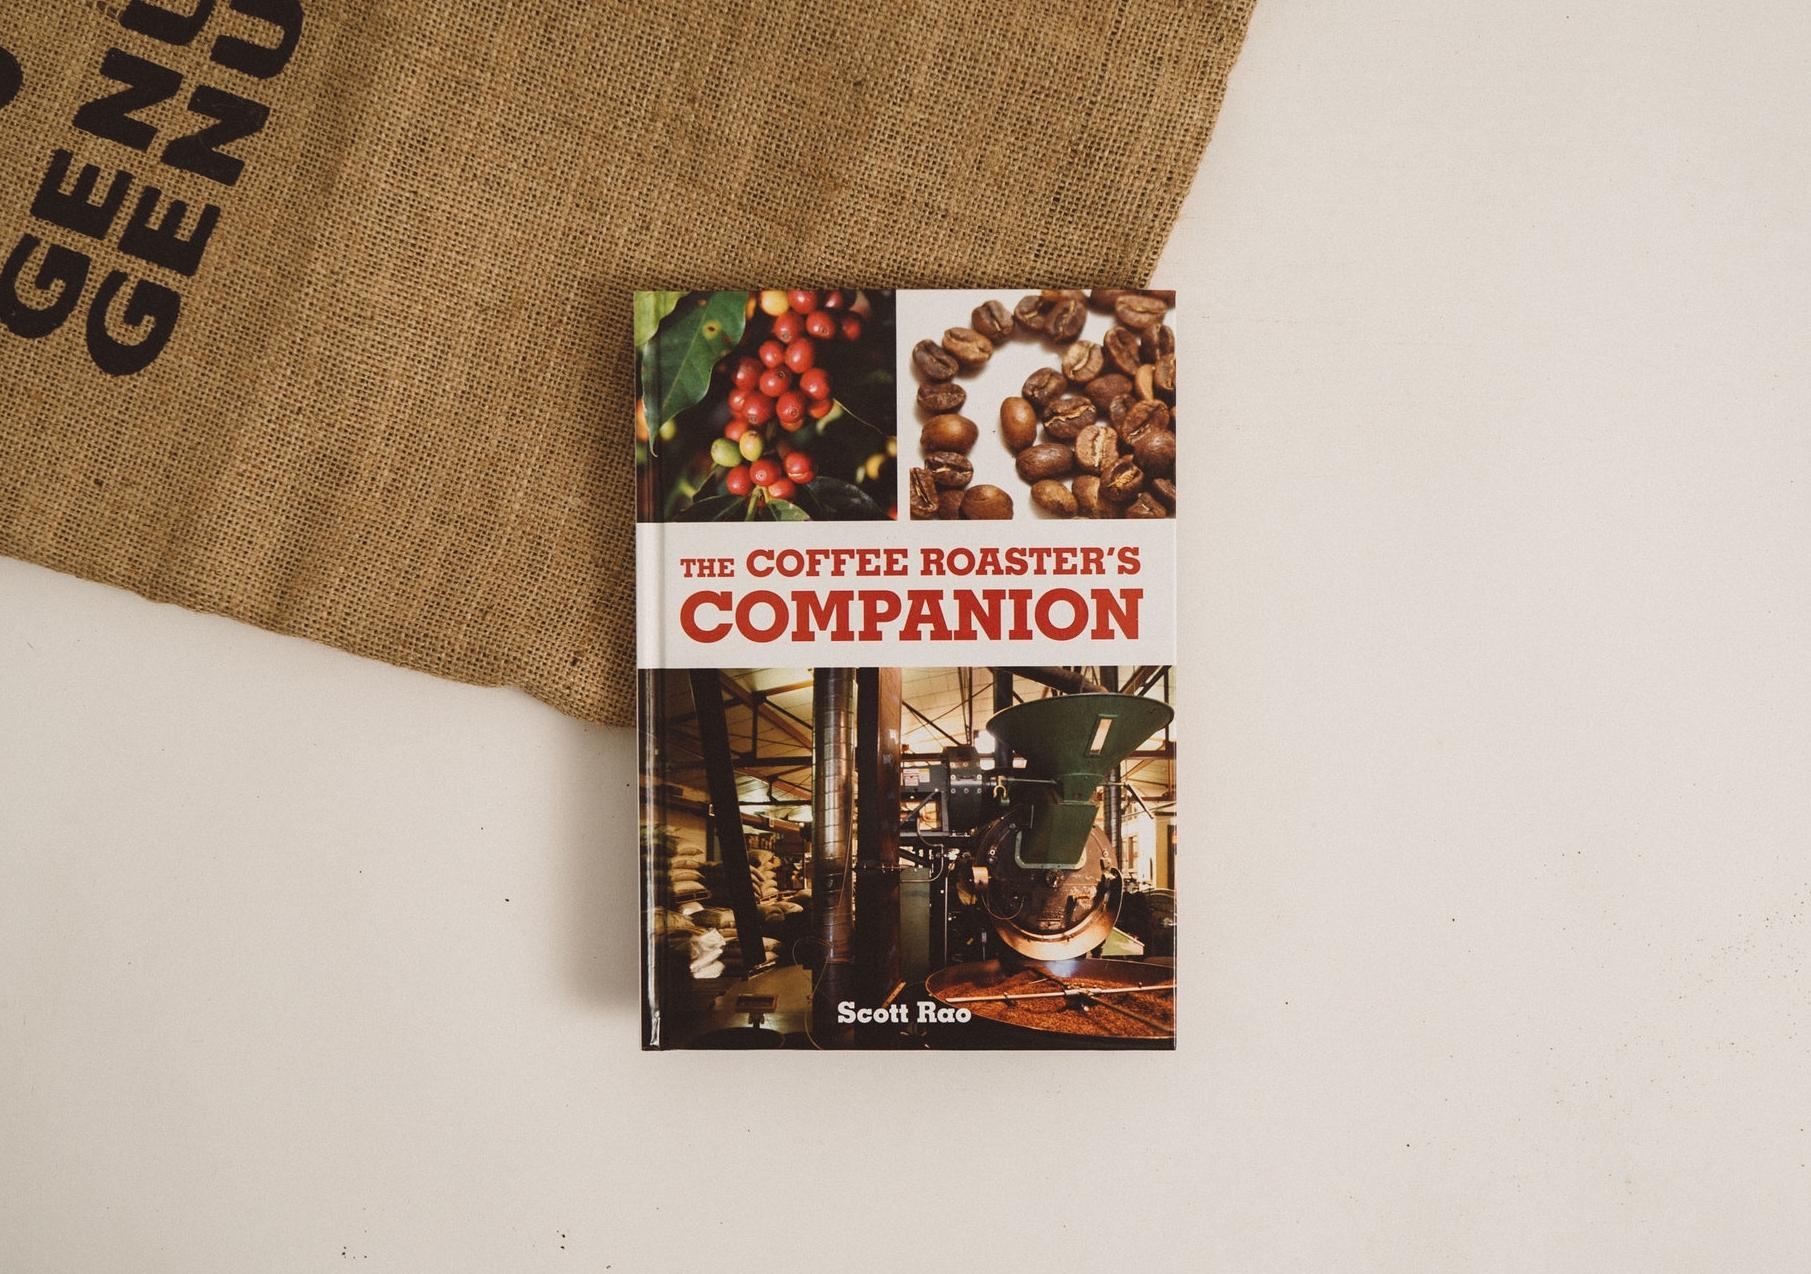 The Coffee Roaster's Companion